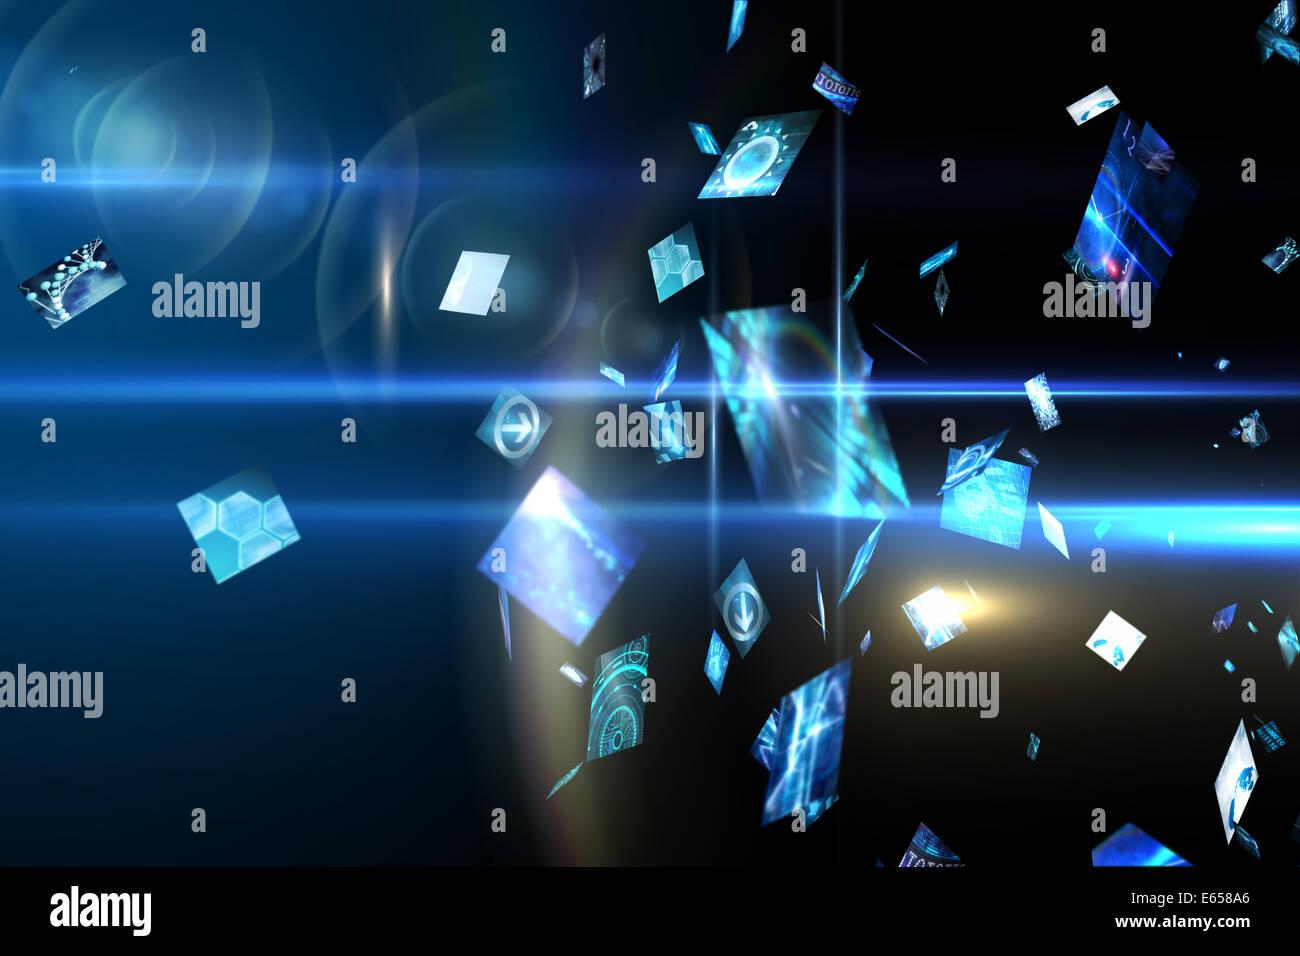 Floating digital screens in blue - Stock Image